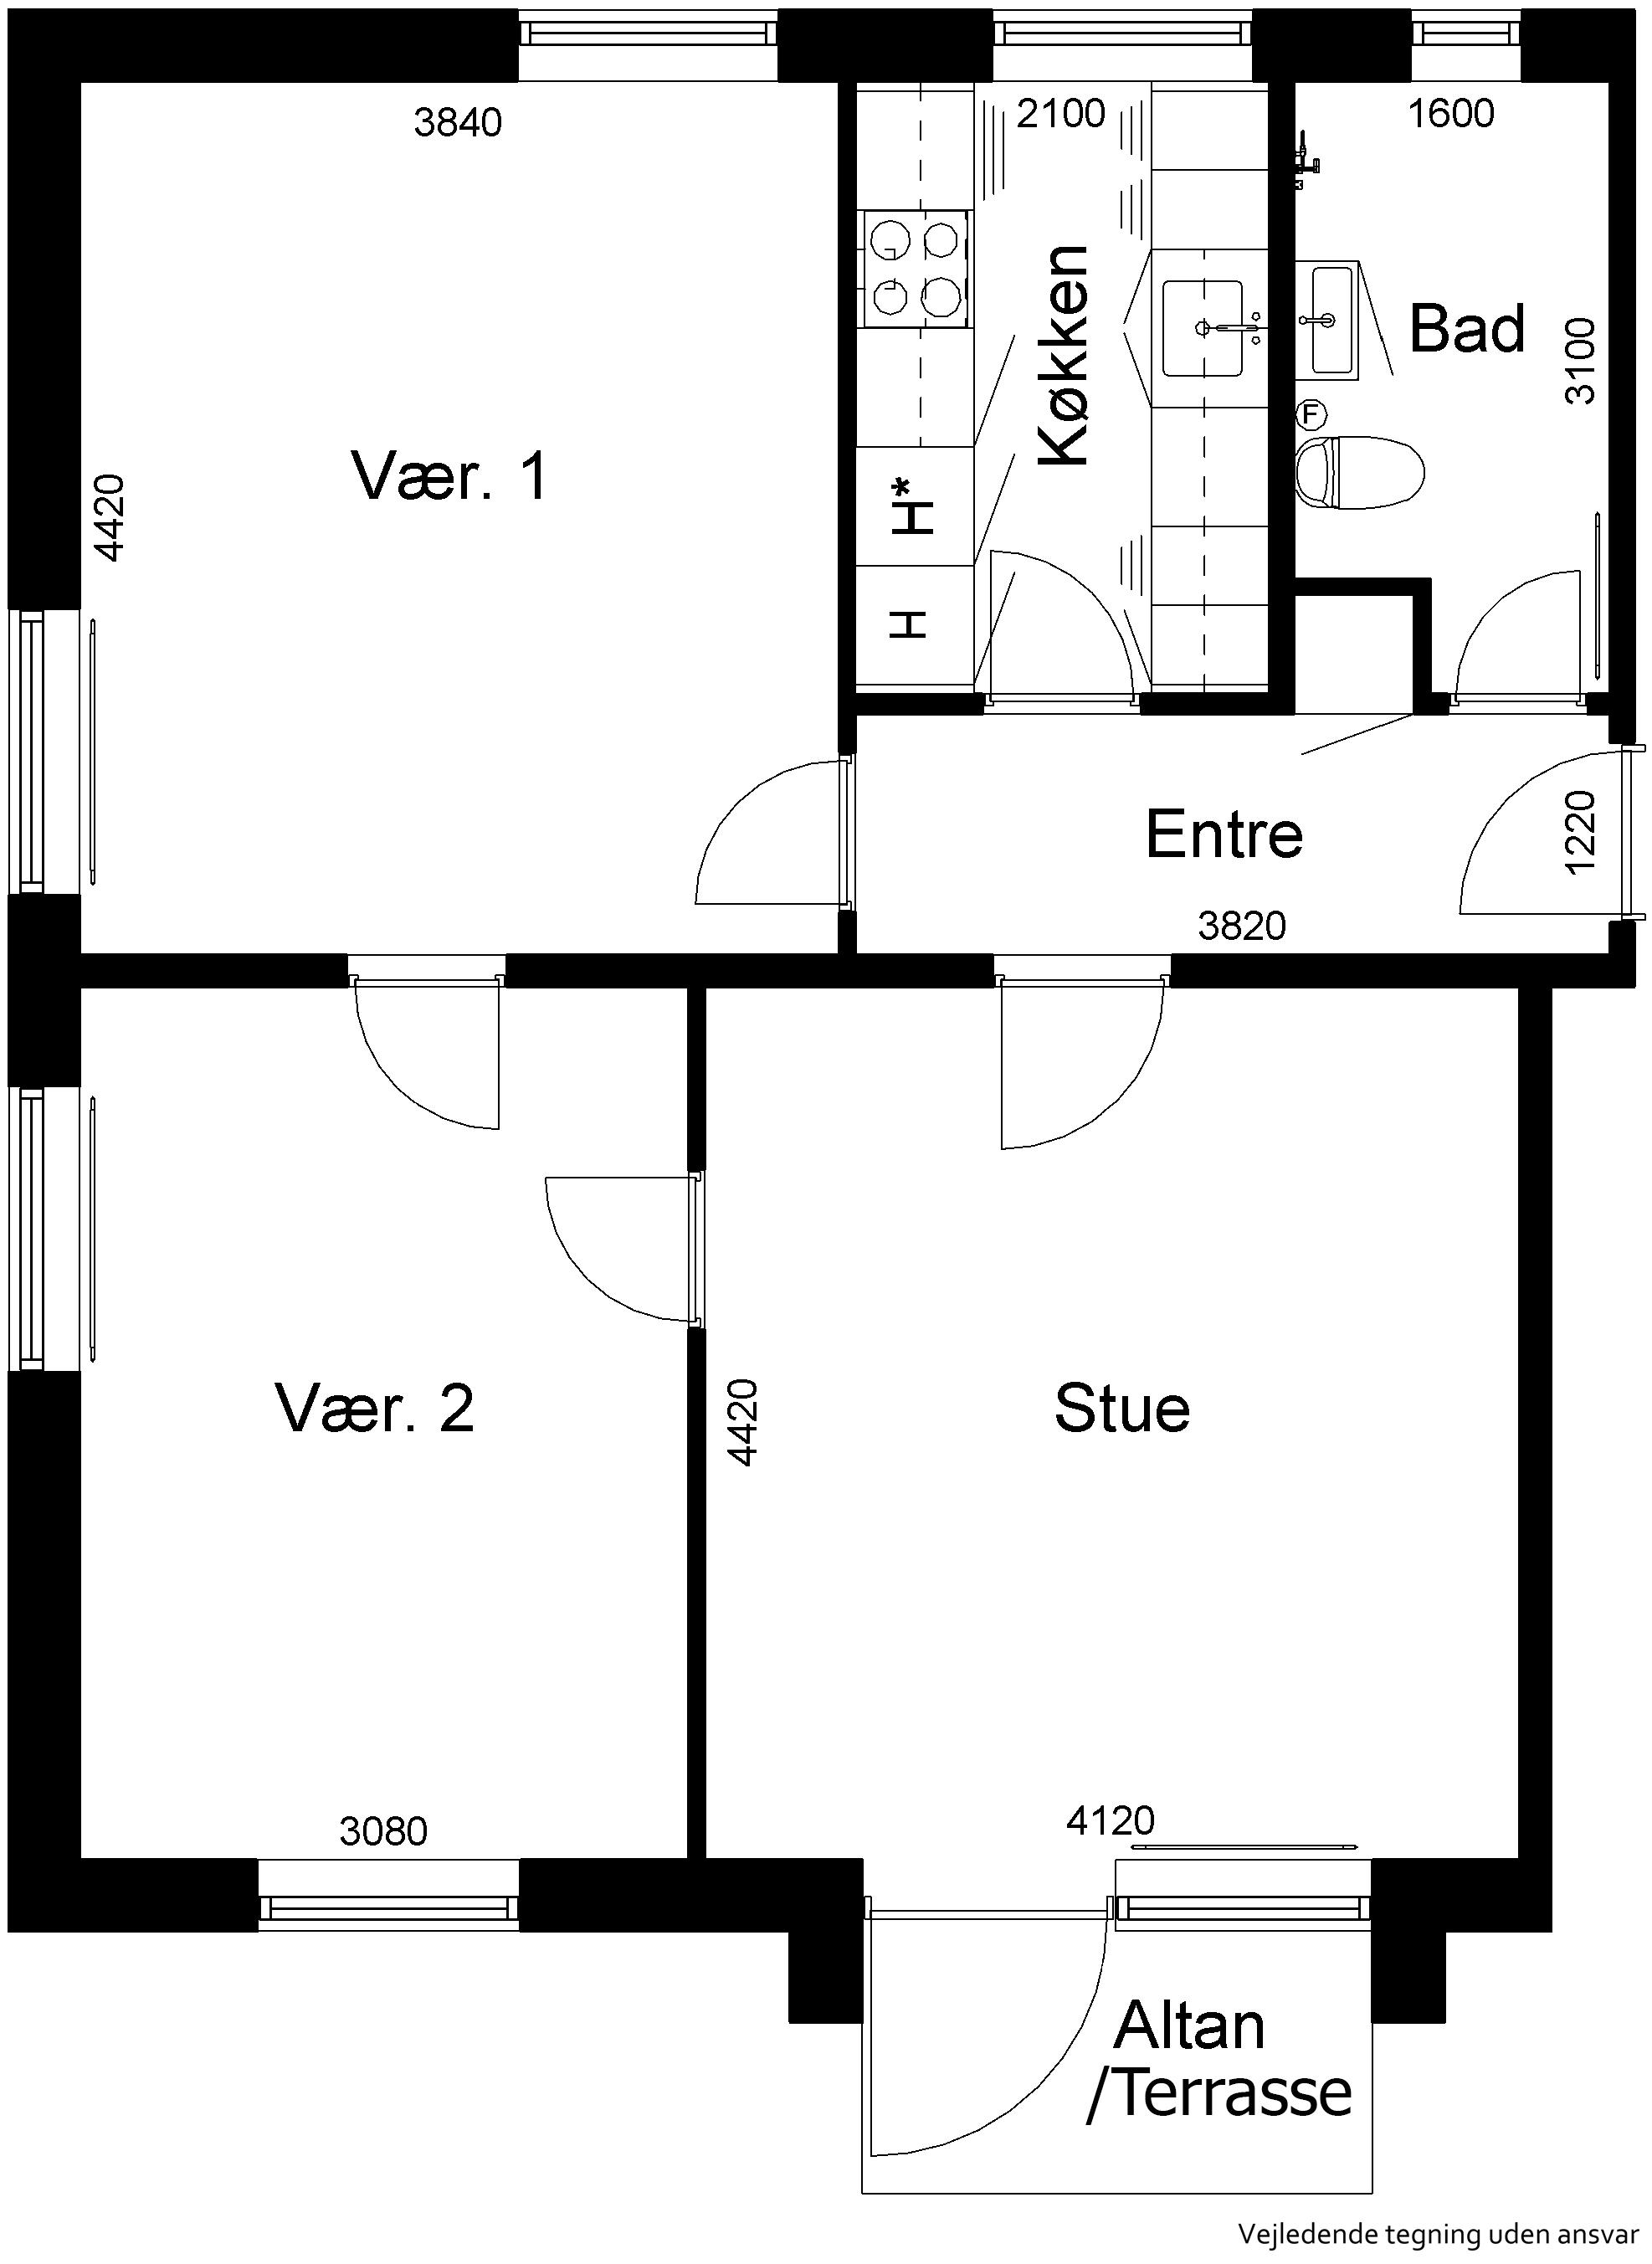 boligkontoret danmark espergærde